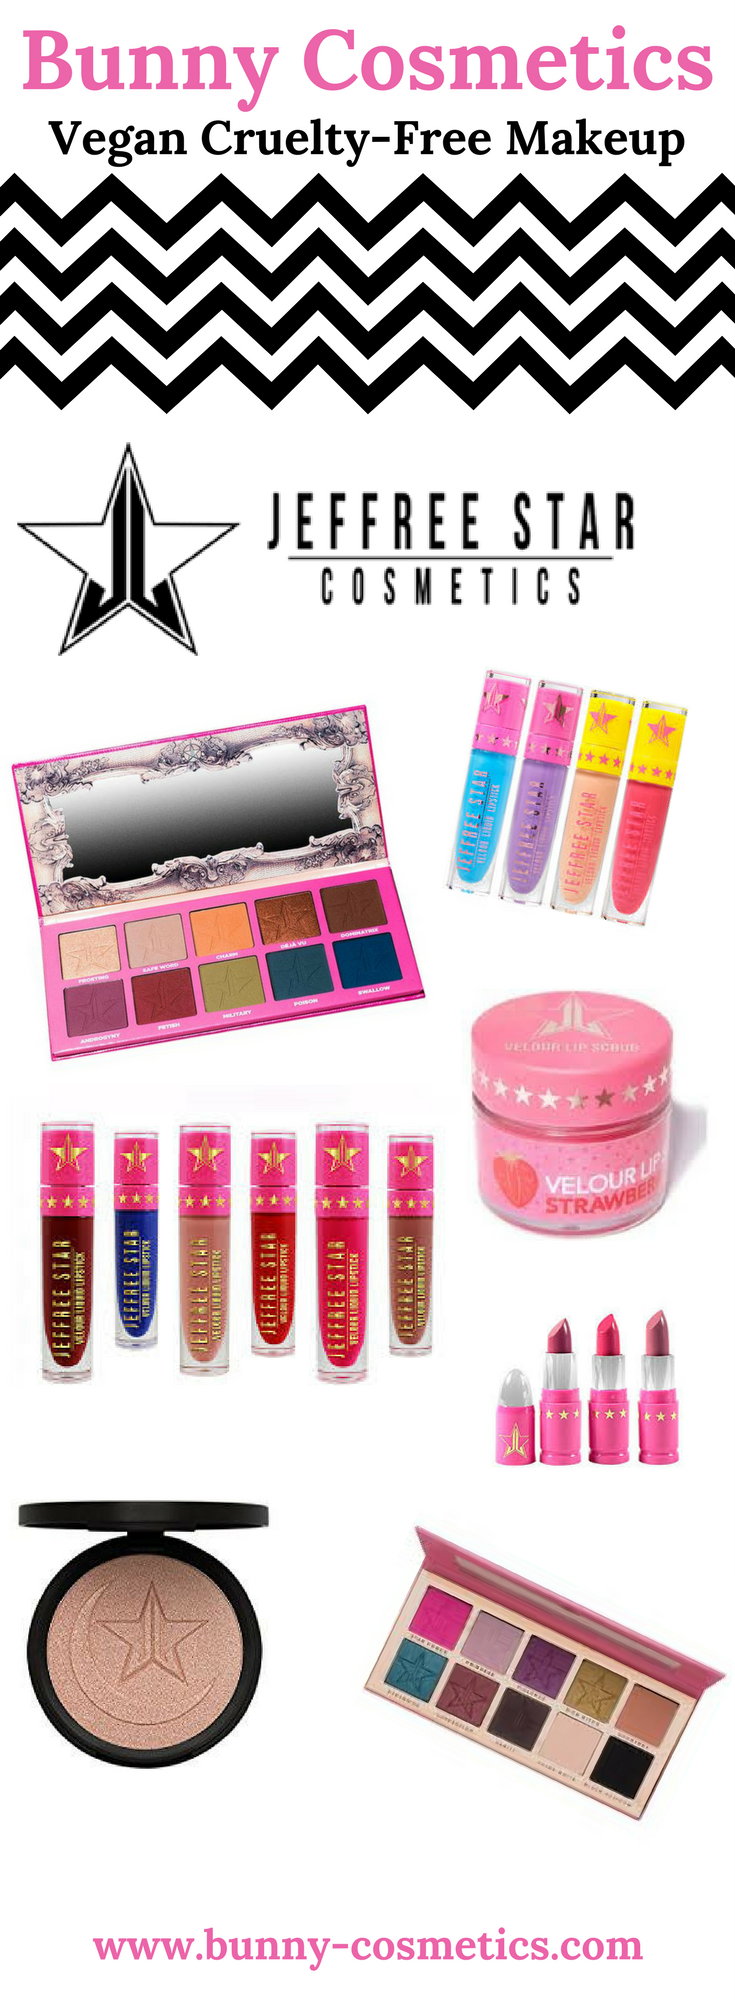 Vegan CrueltyFree Makeup Brand JEFFREE STAR COSMETICS